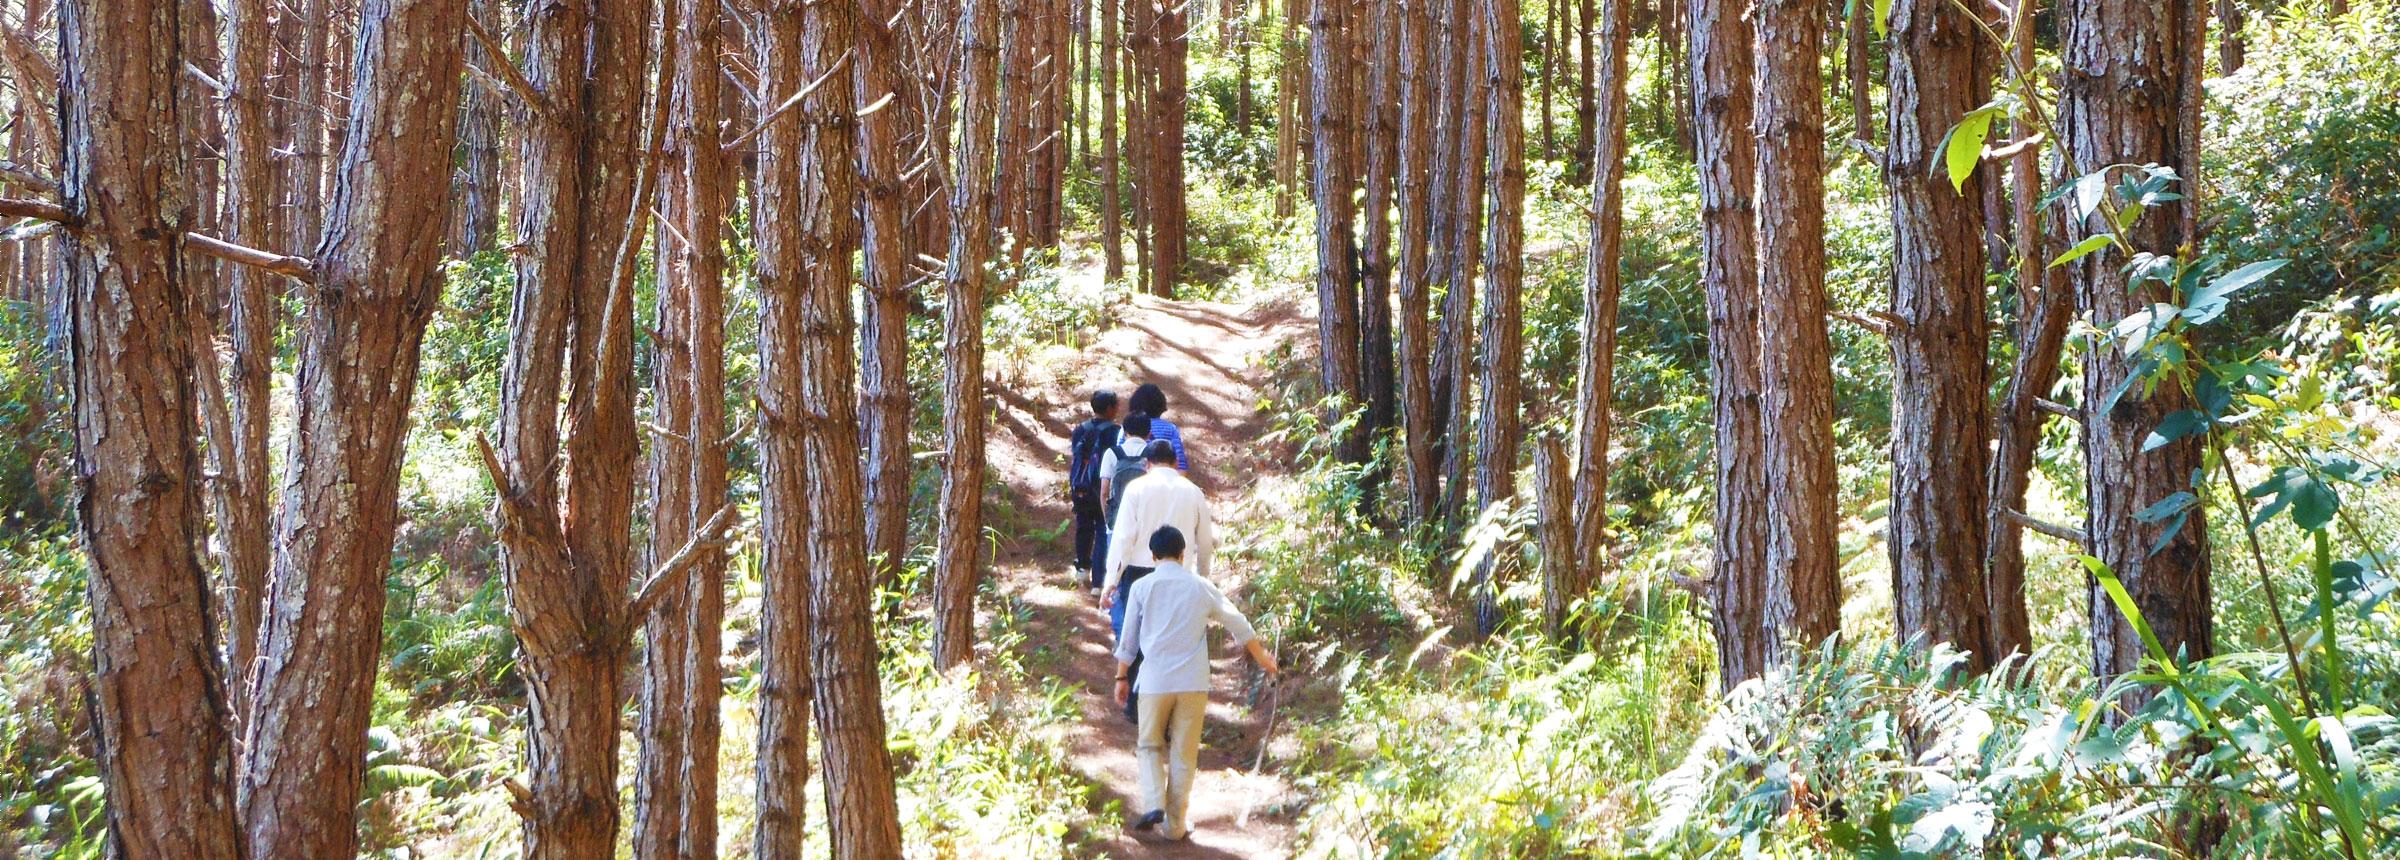 People walking in forest